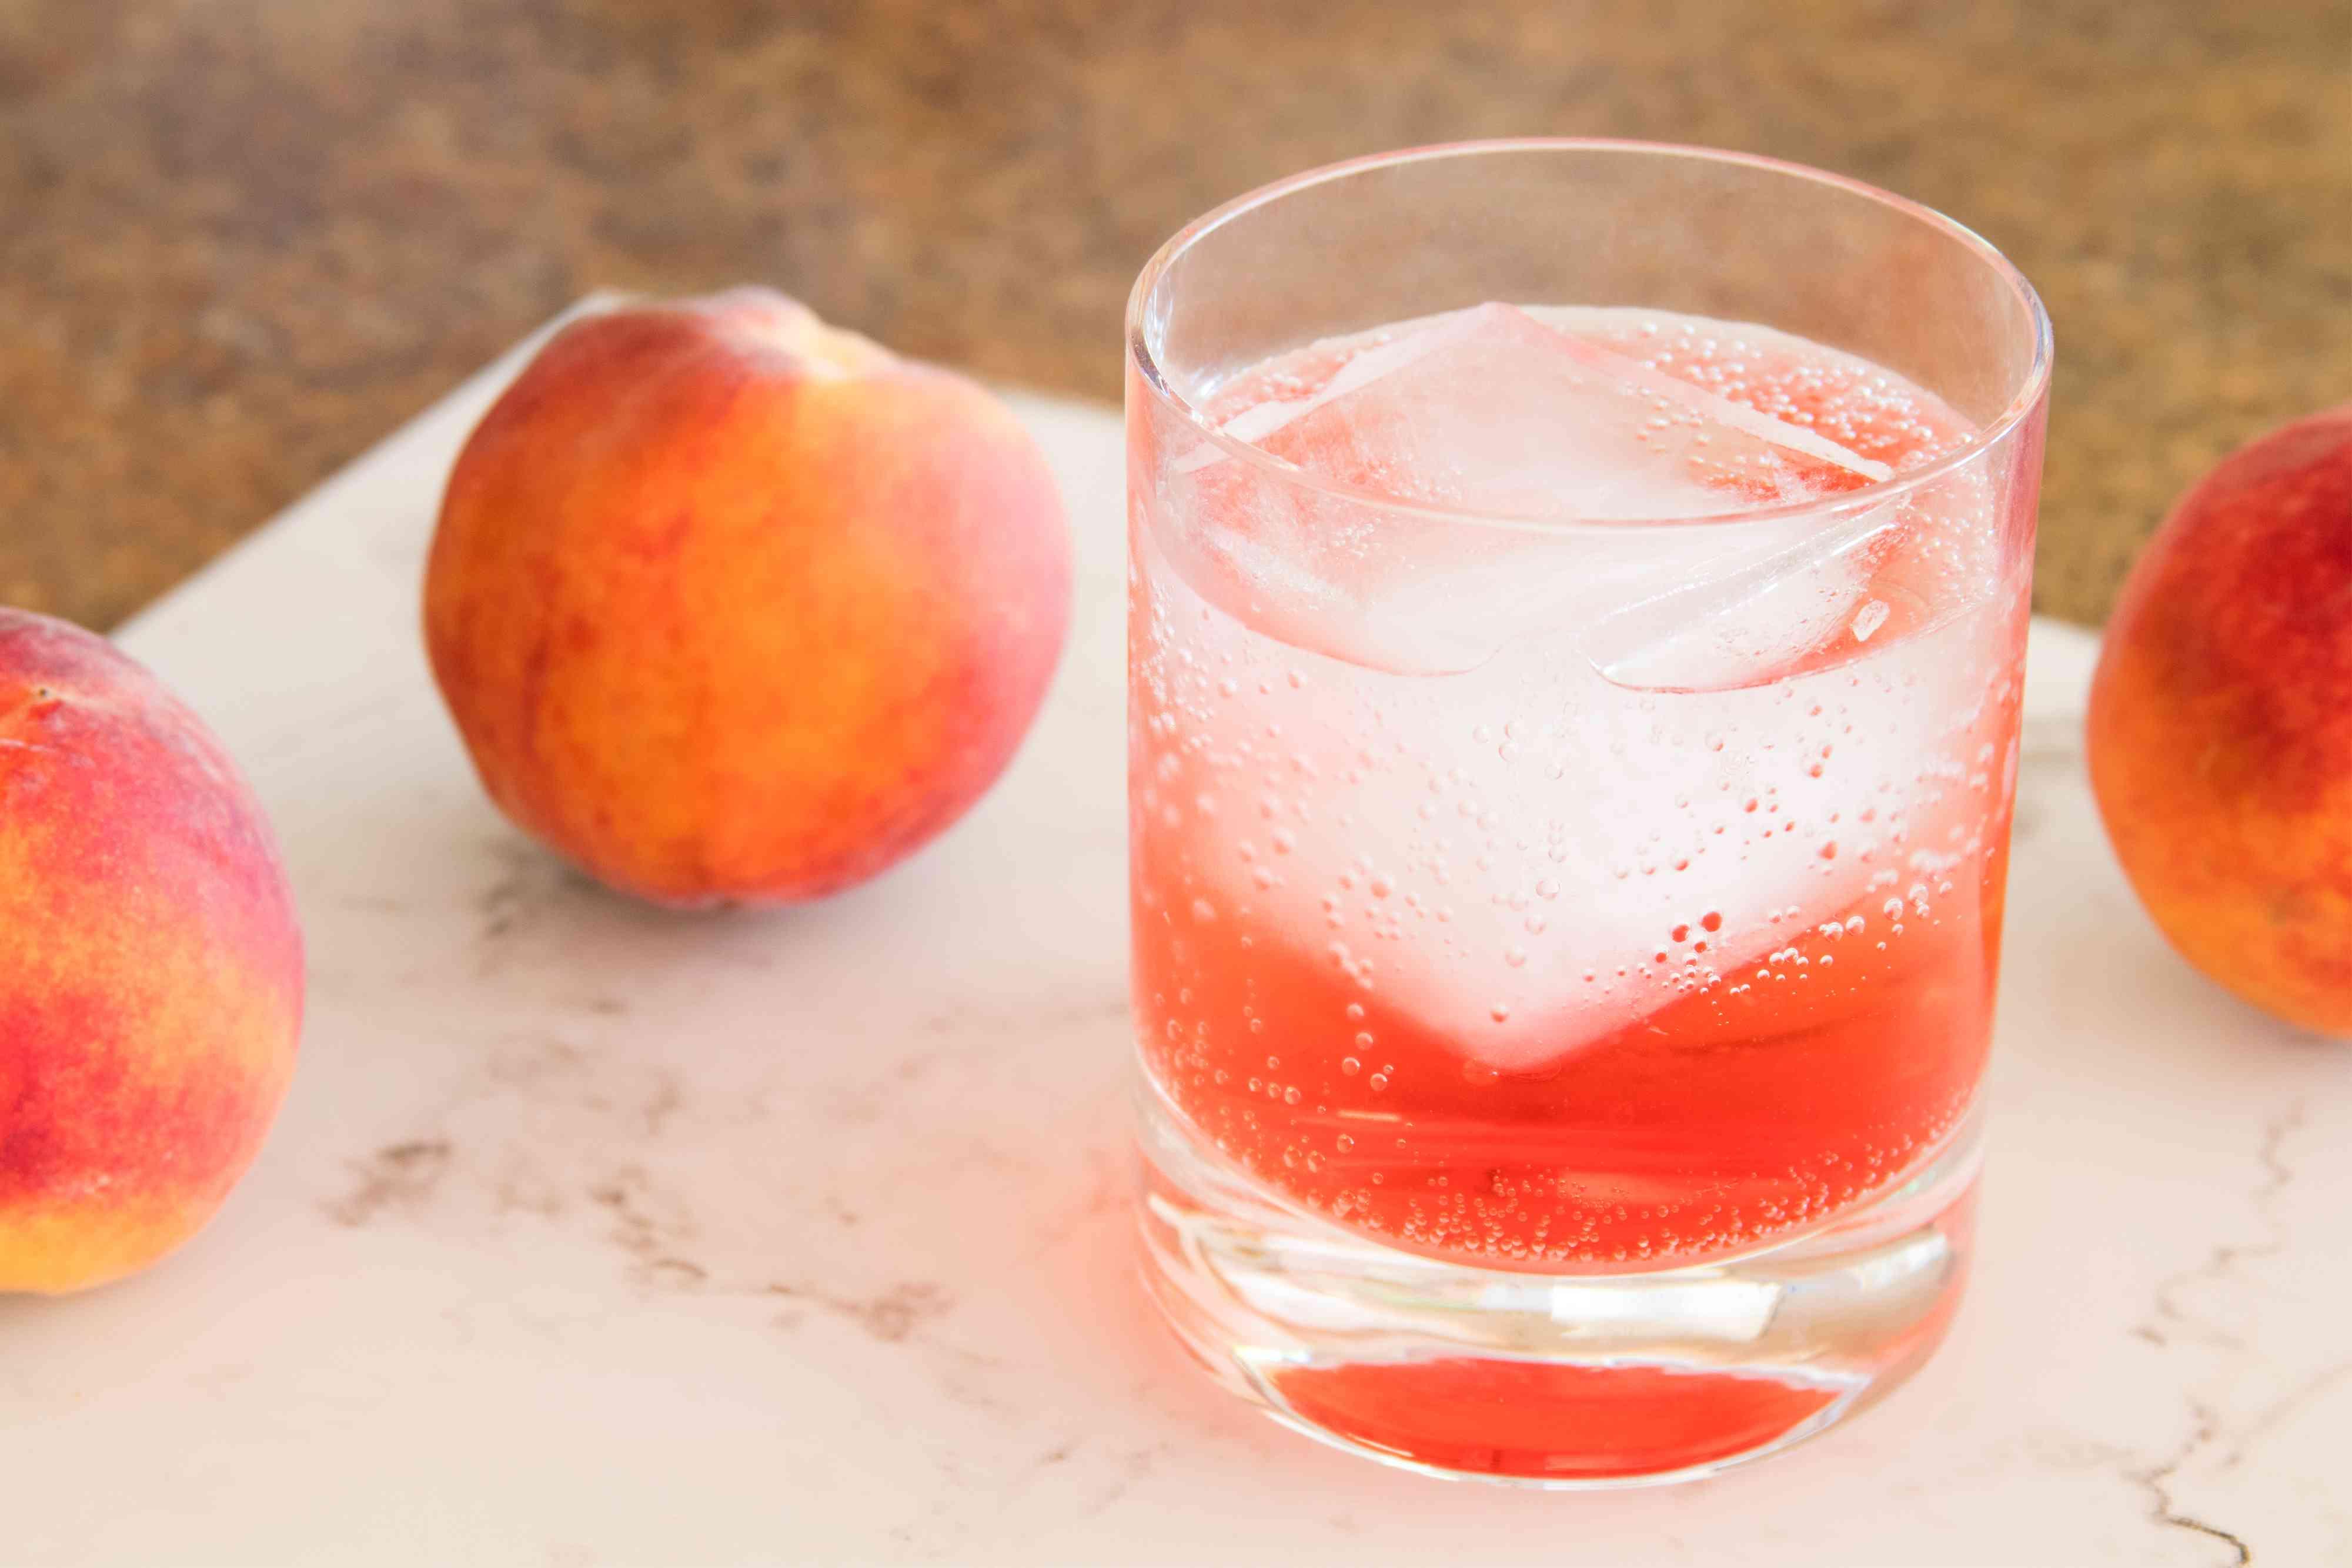 Sparkling Peach Sunrise Nonalcoholic Drink